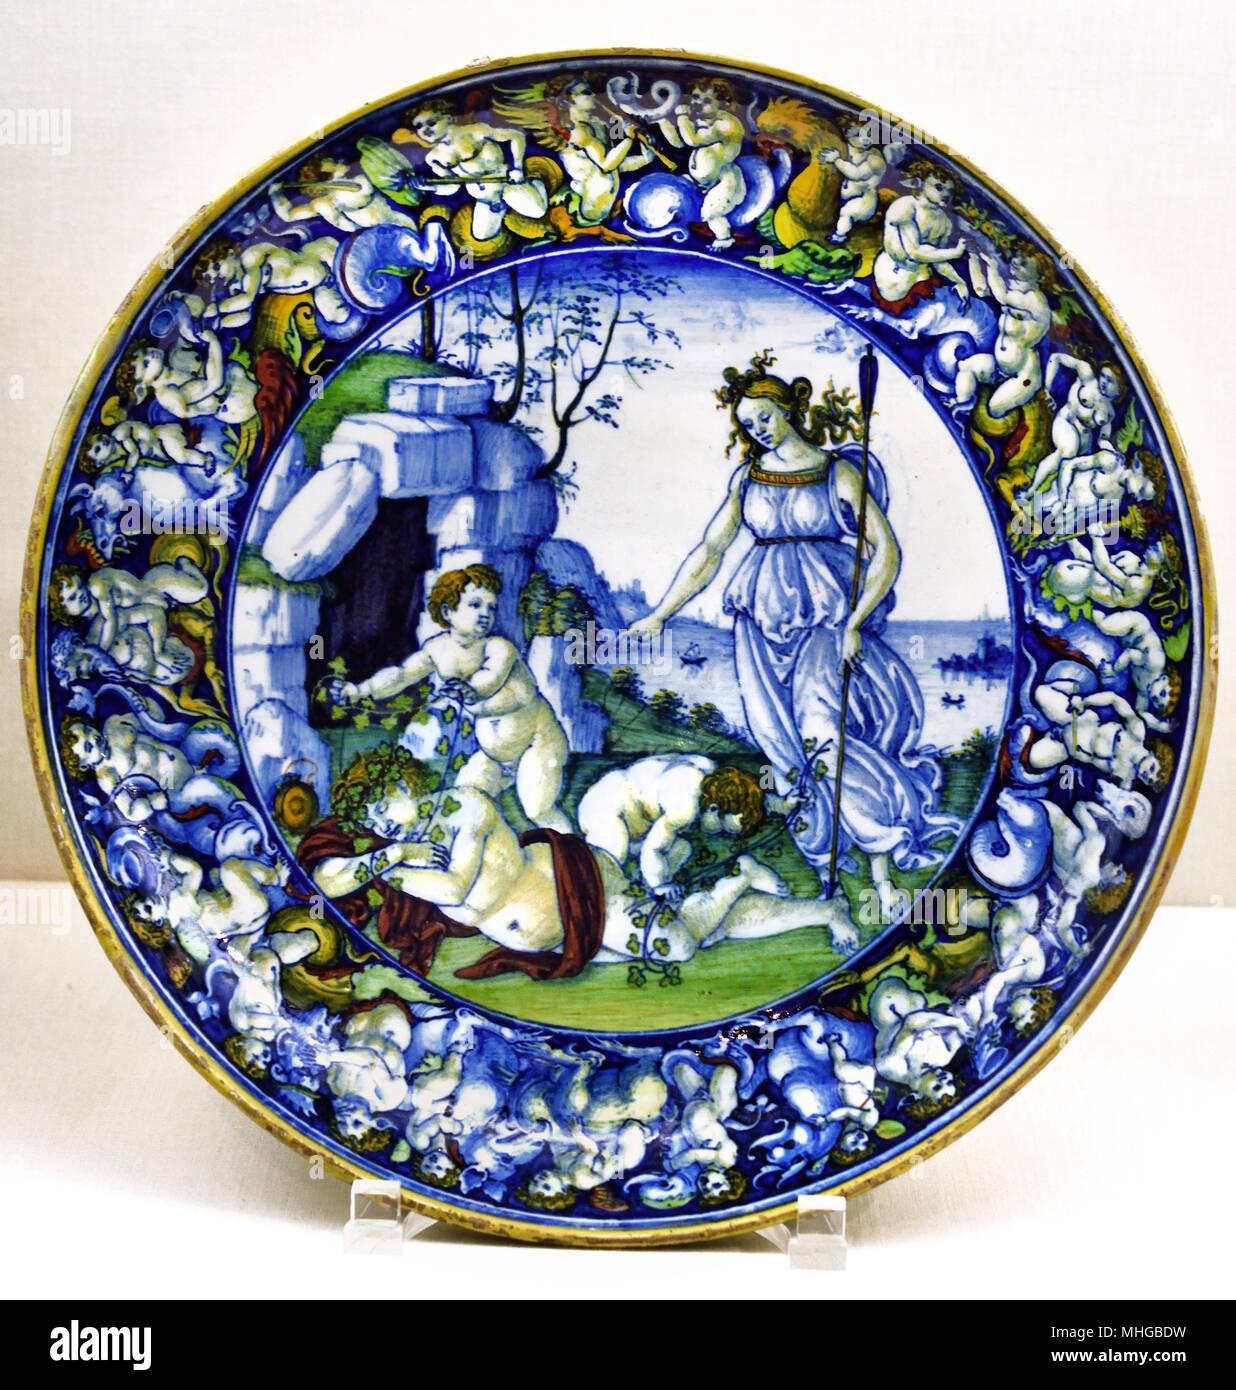 Plat italien 1ère moitié 16e siècle Italie Cafaggiolo ( Maiolica ) Photo Stock